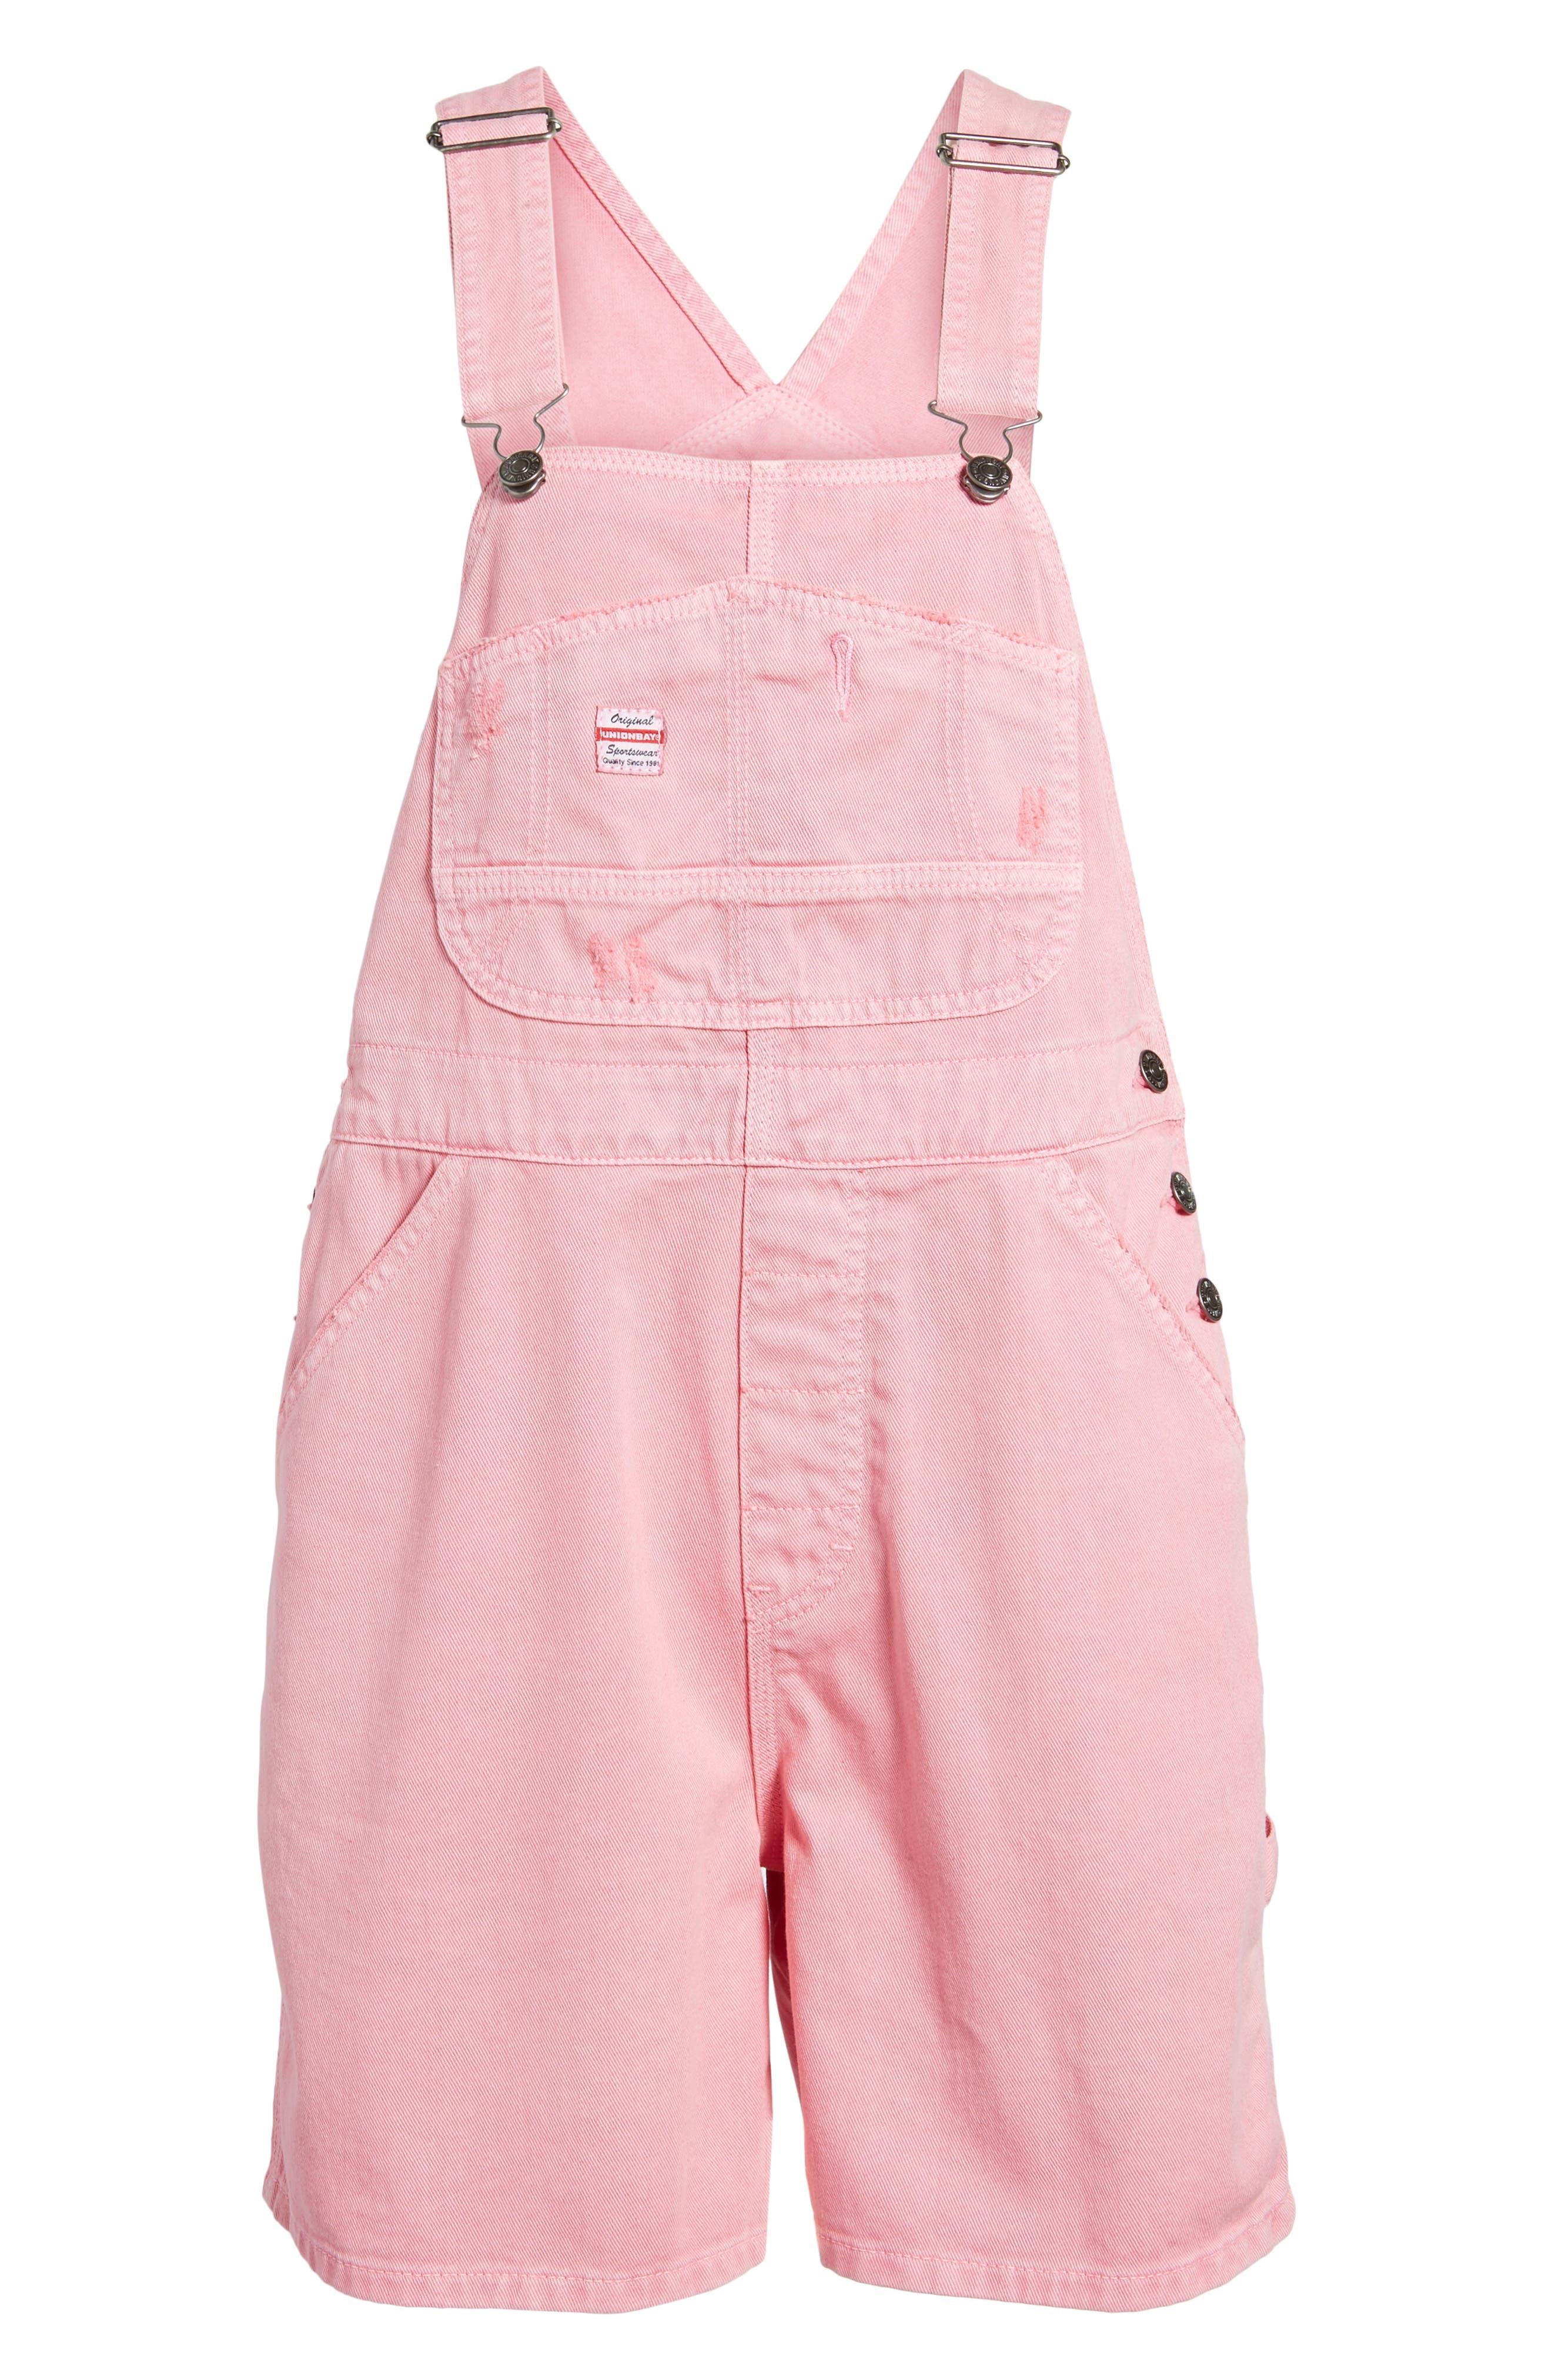 Unionbay Mario Denim Shortalls,                             Alternate thumbnail 6, color,                             Popsicle Pink